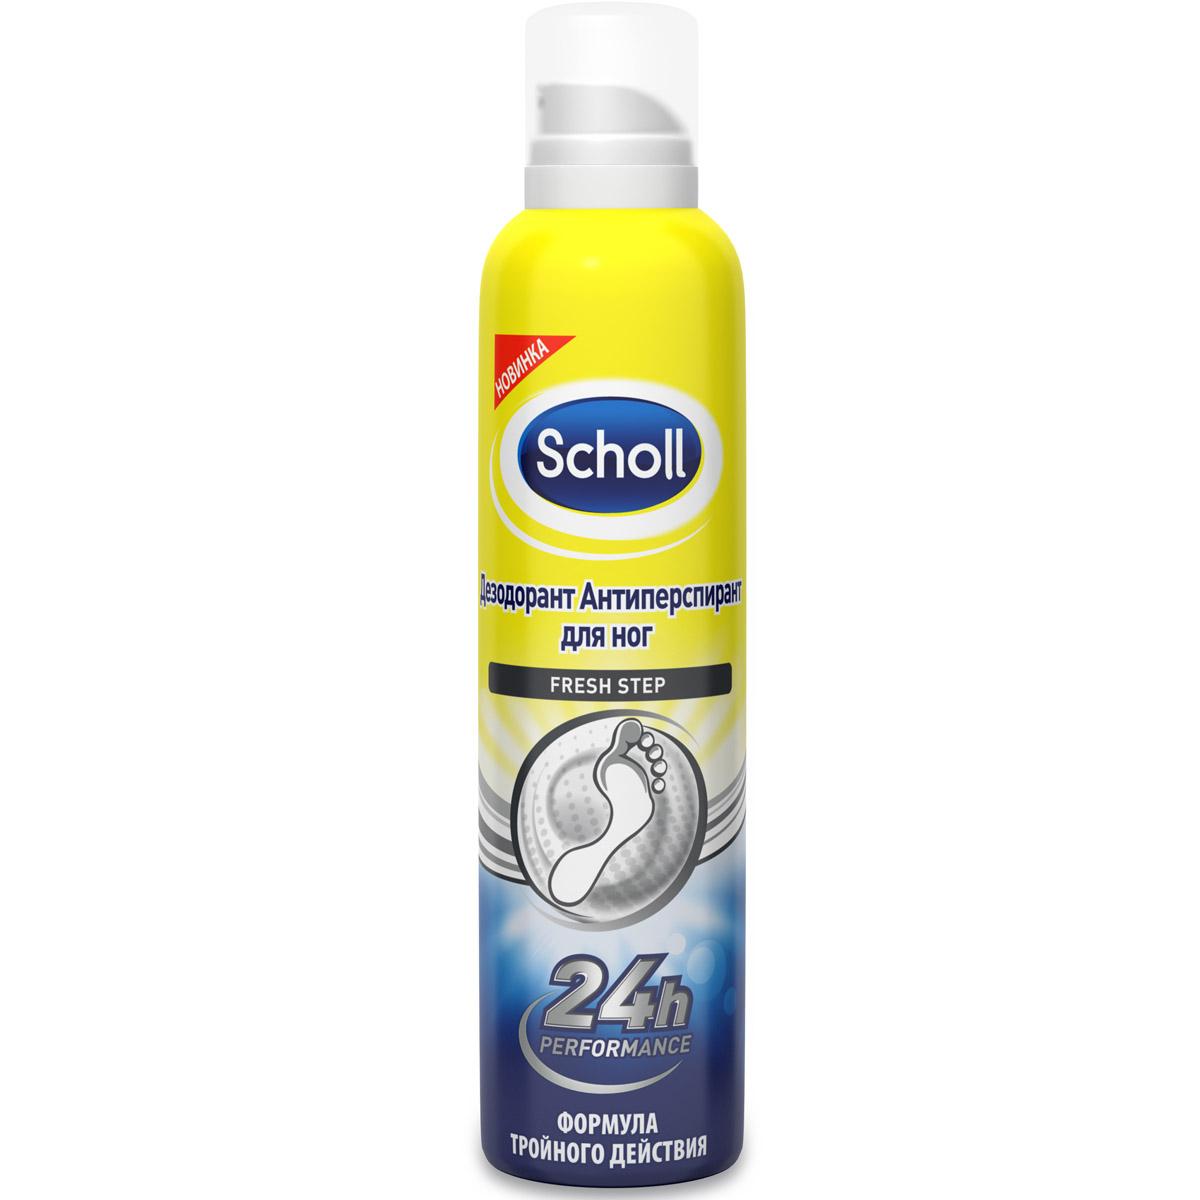 ����� ��� ��� Scholl Deo-Activ Fresh ���������� (��������� ��������) 150 ��